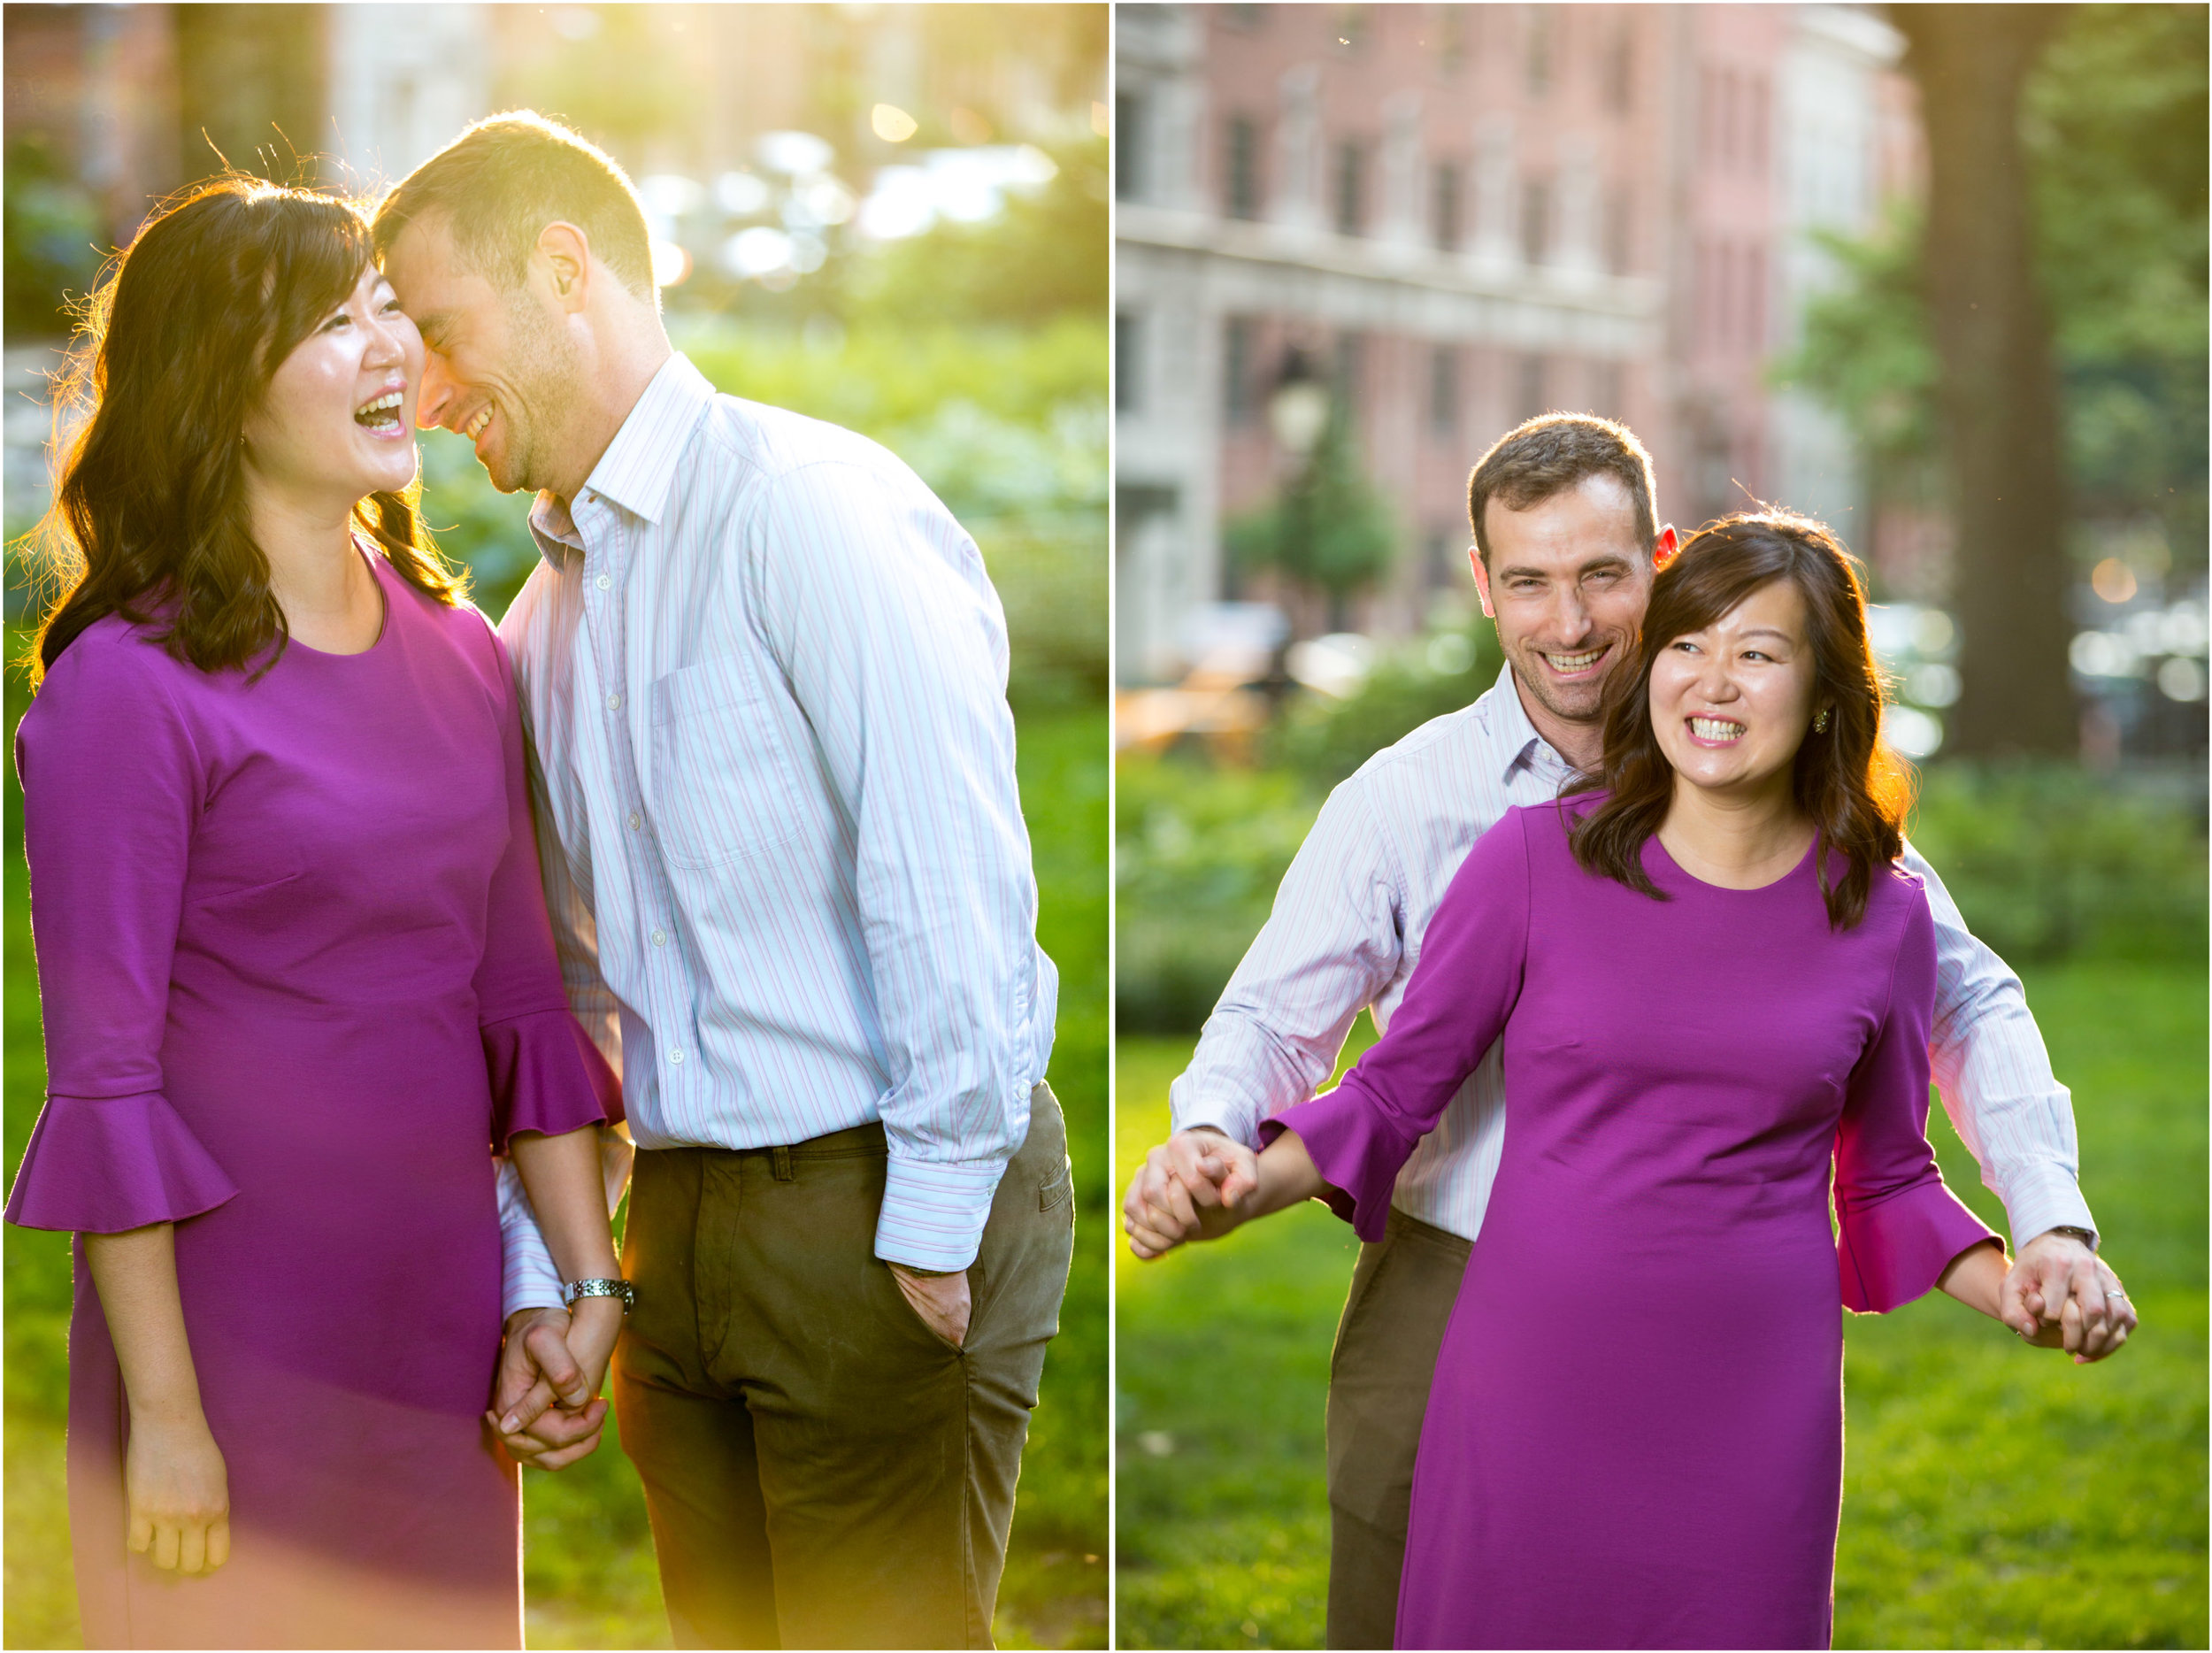 West Village Washington Square Park NYC Marriage Engagement Photo Session Shoot-8.jpg